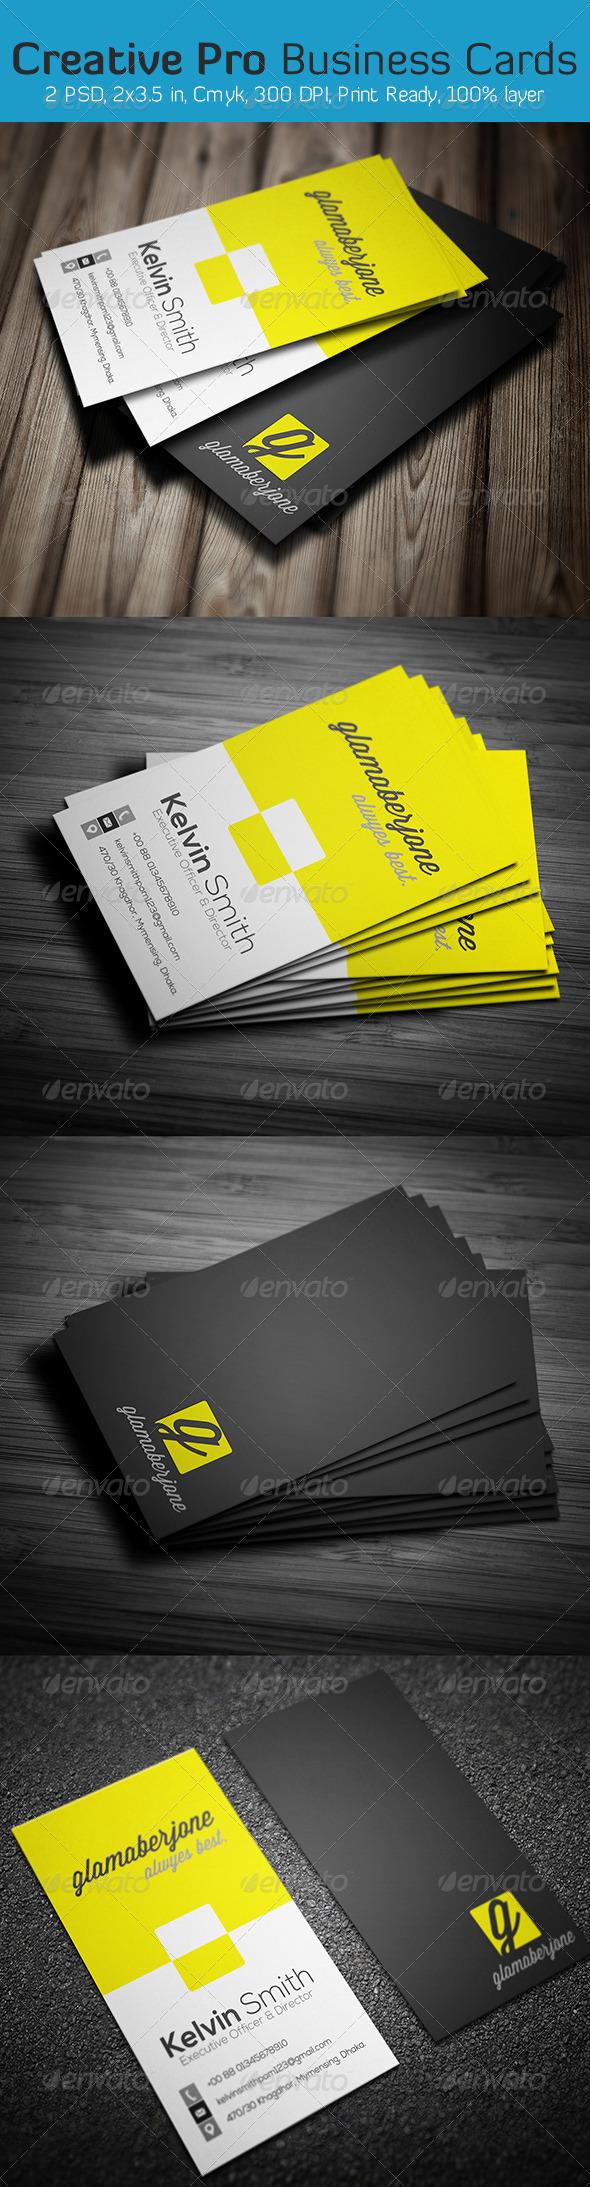 GraphicRiver Creative Pro Business Card 6366043